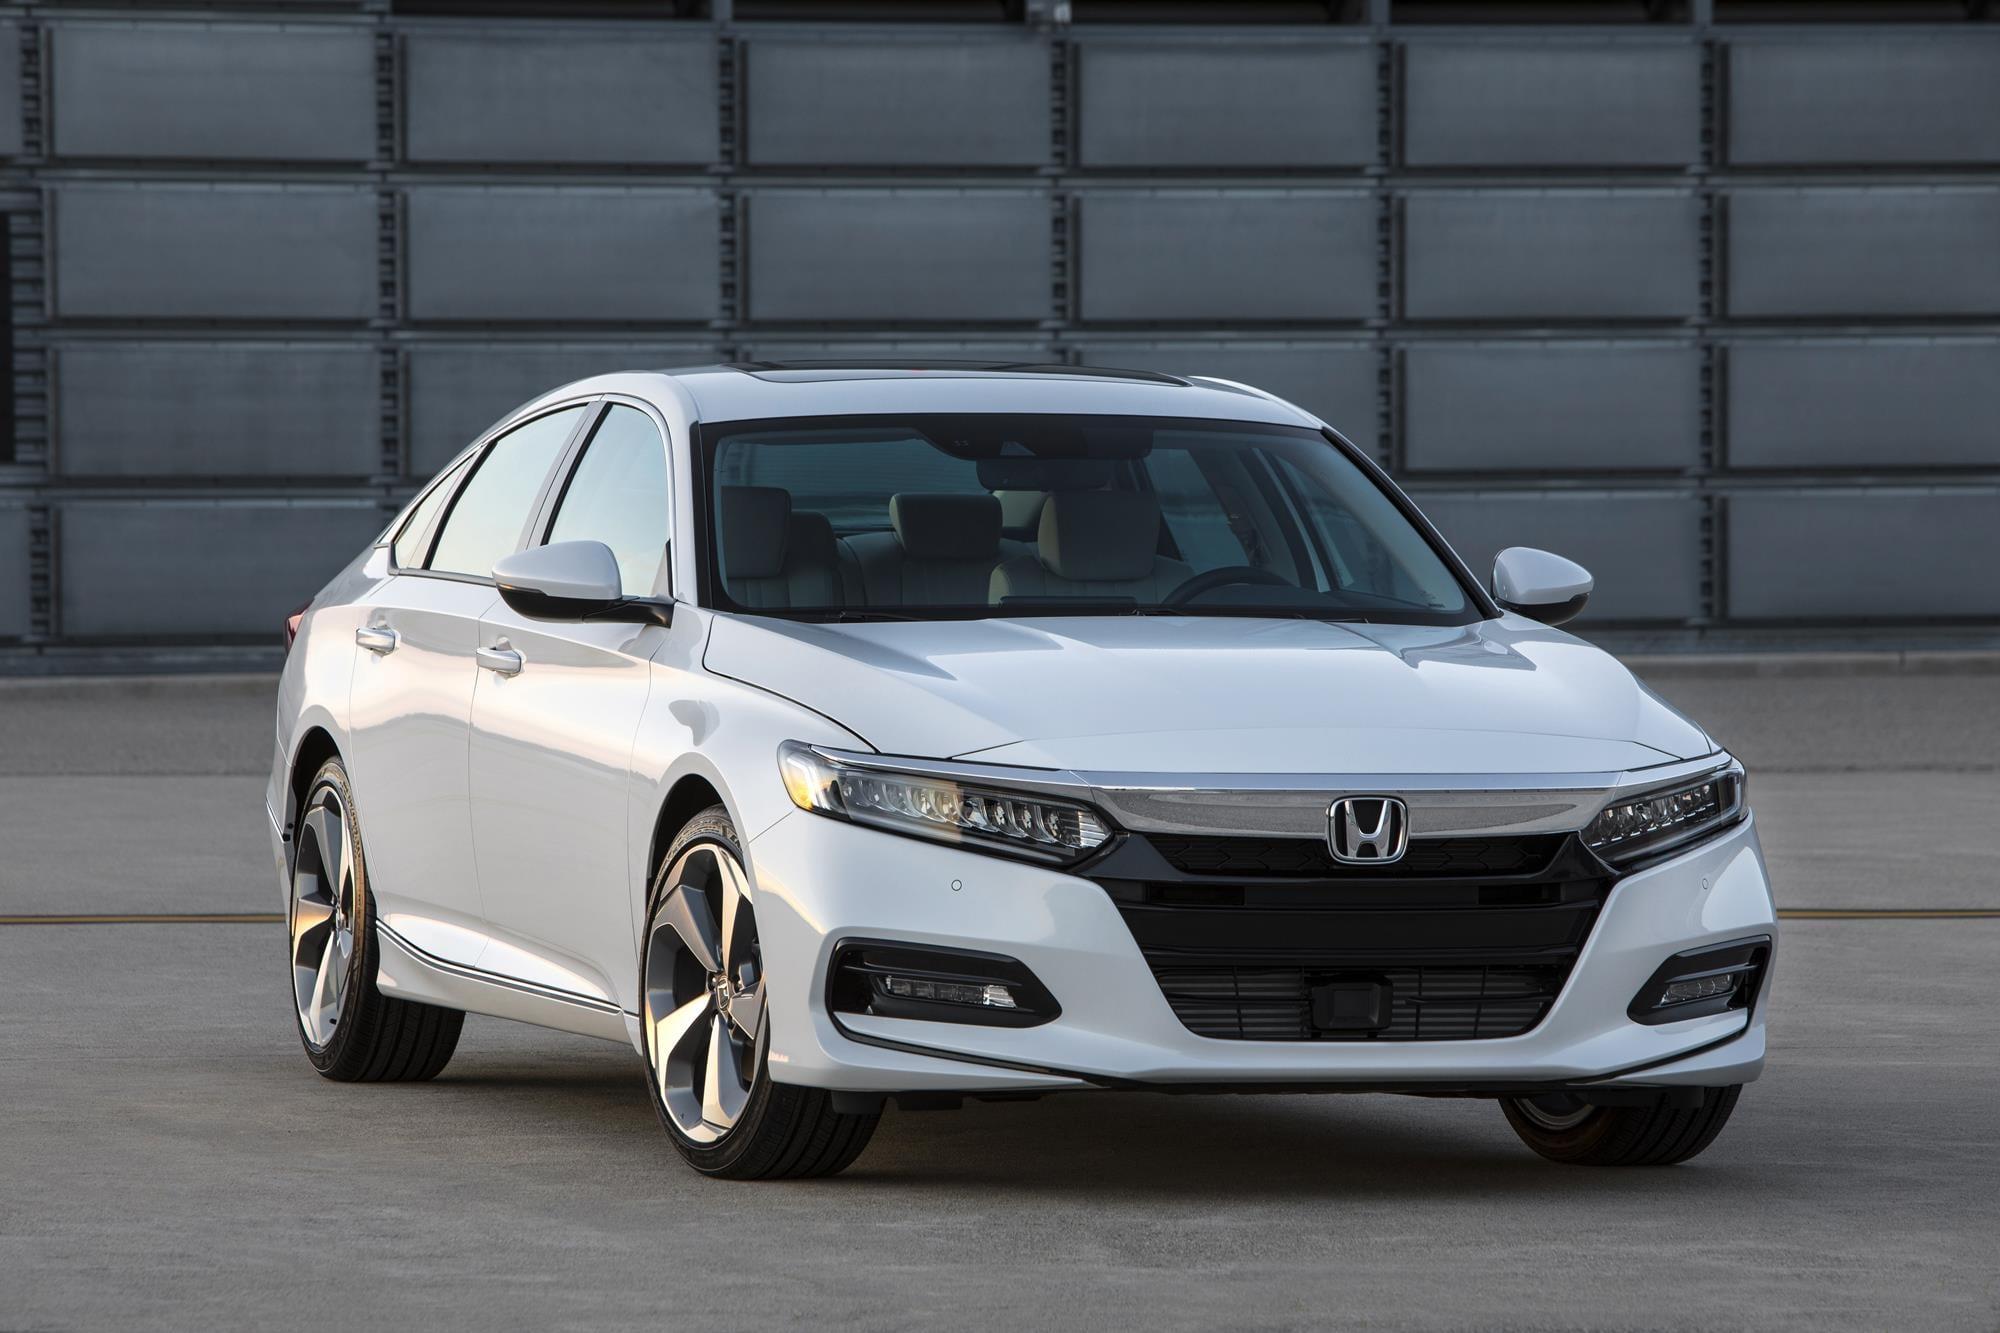 2018 Honda Accord Completely Redesigned - CarNewsCafe.com